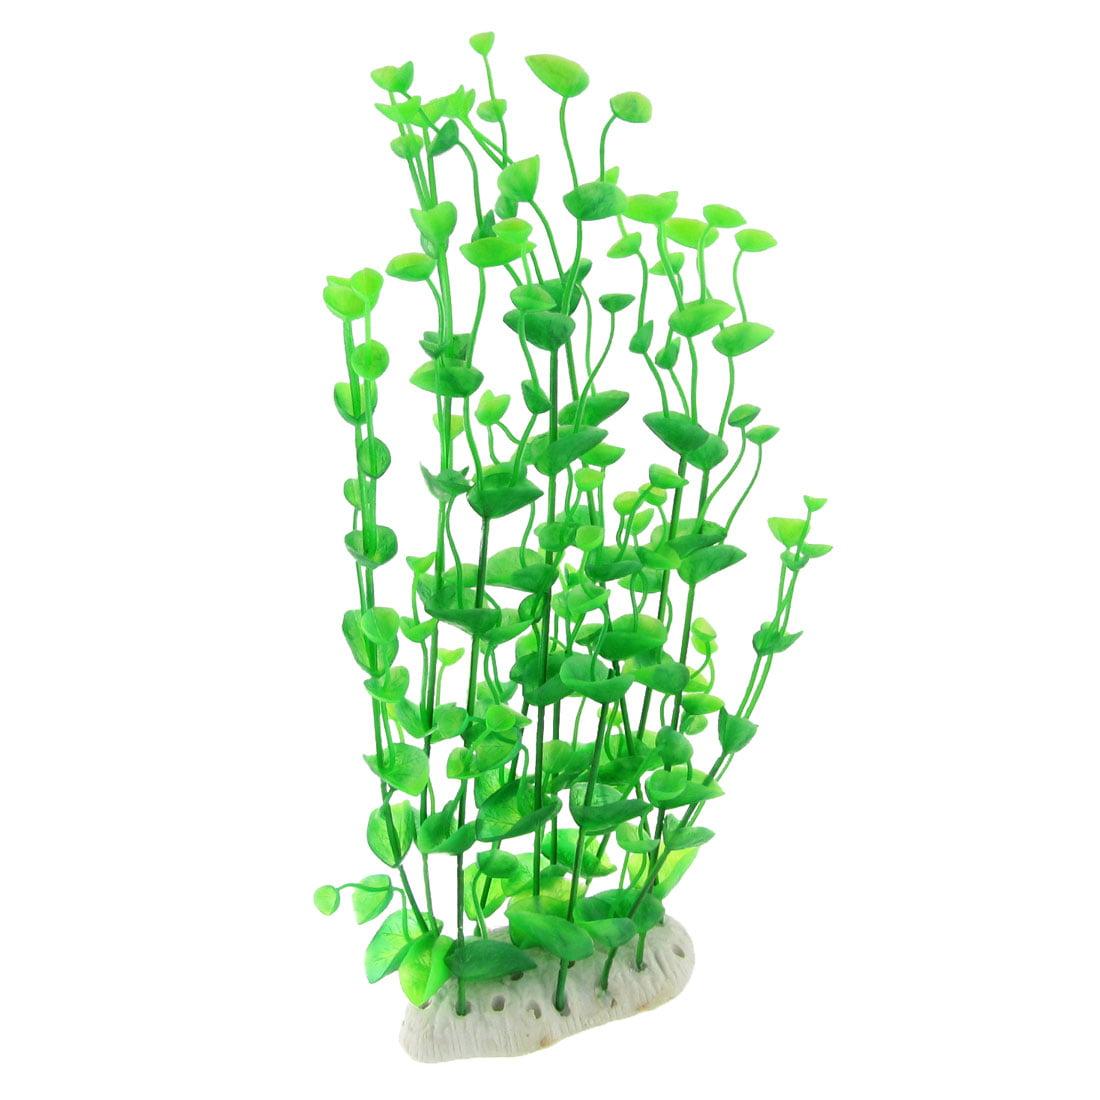 Unique Bargains Unique Bargains Green 12 2 / 5 Emulational Plastic Aquatic Plant Ornament for Aquarium Tank